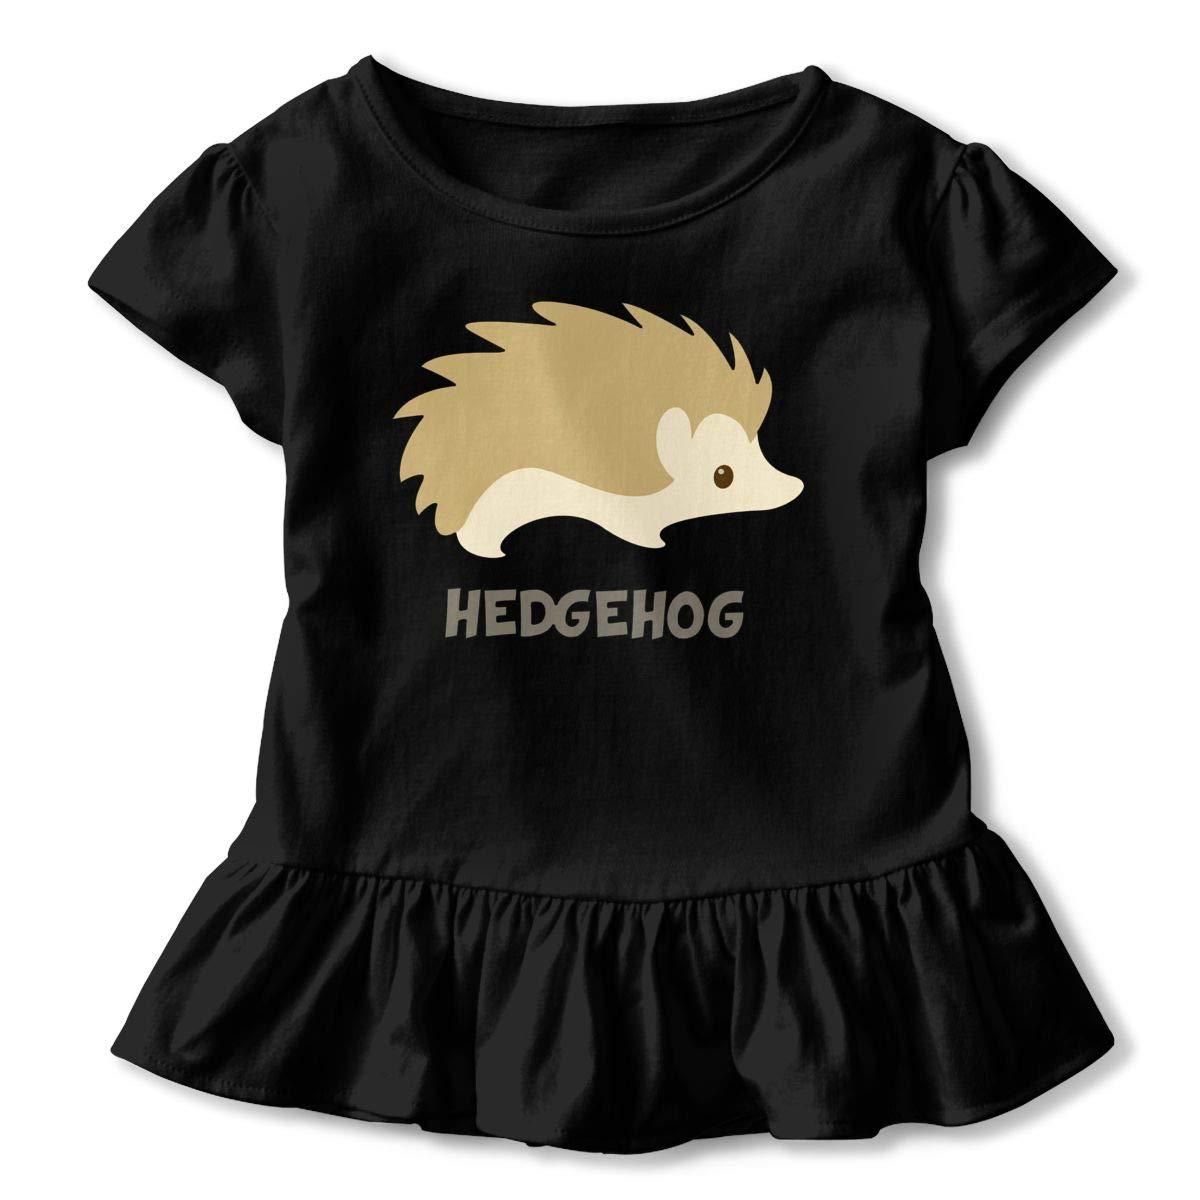 Embrace Hedgehogs Toddler Baby Girls Cotton Ruffle Short Sleeve Top Comfortable T-Shirt 2-6T